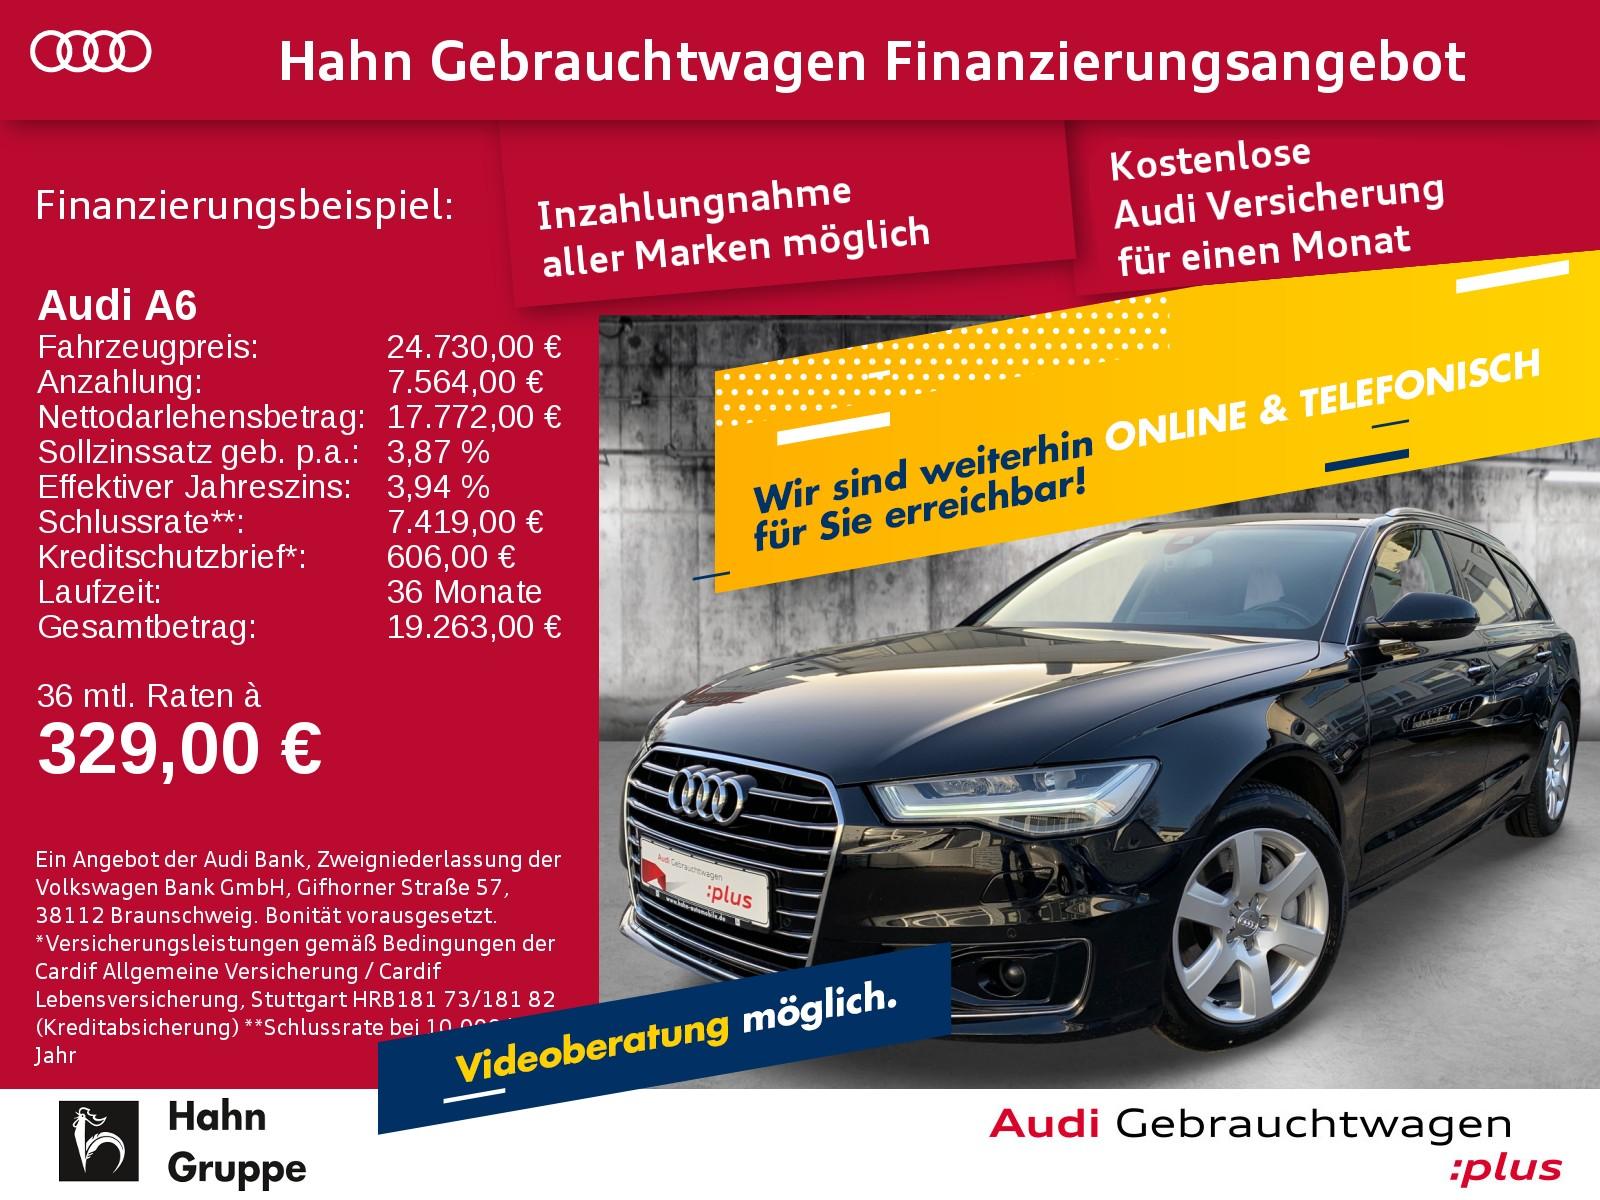 Audi A6 Avant 3.0TDI S-trc Navi LED AHK CAM ACC Sitzh, Jahr 2015, Diesel